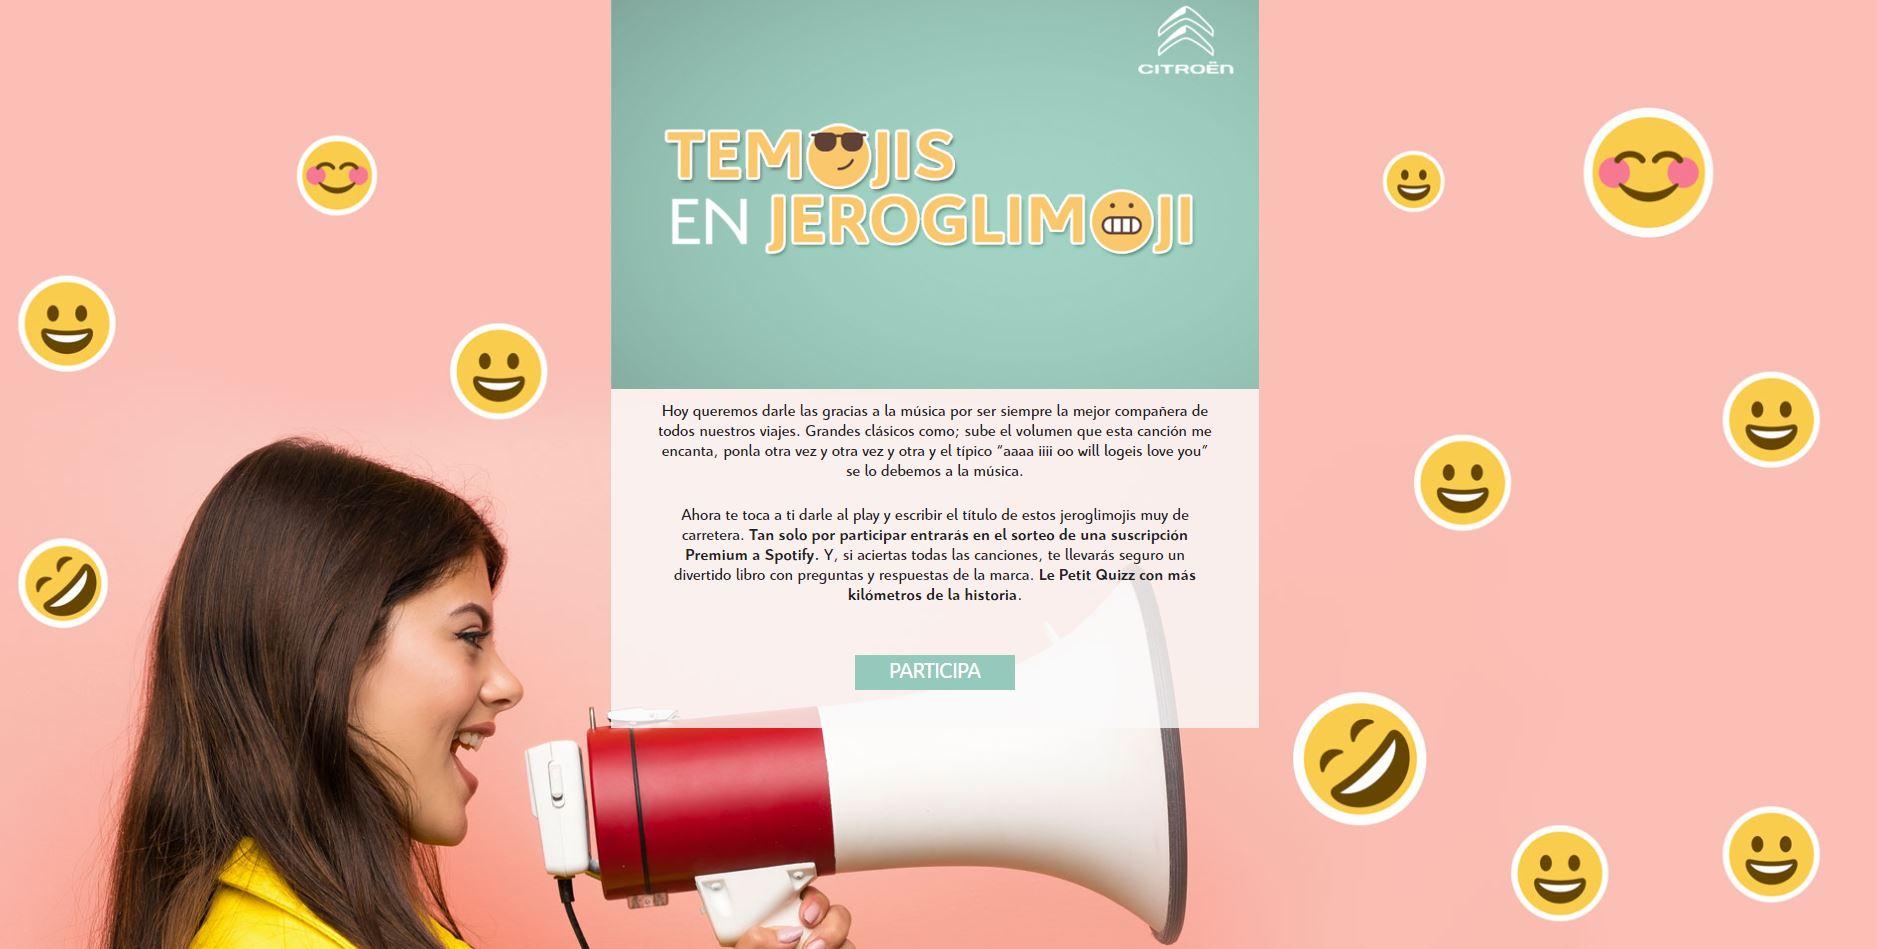 emoji-marketing-citroen